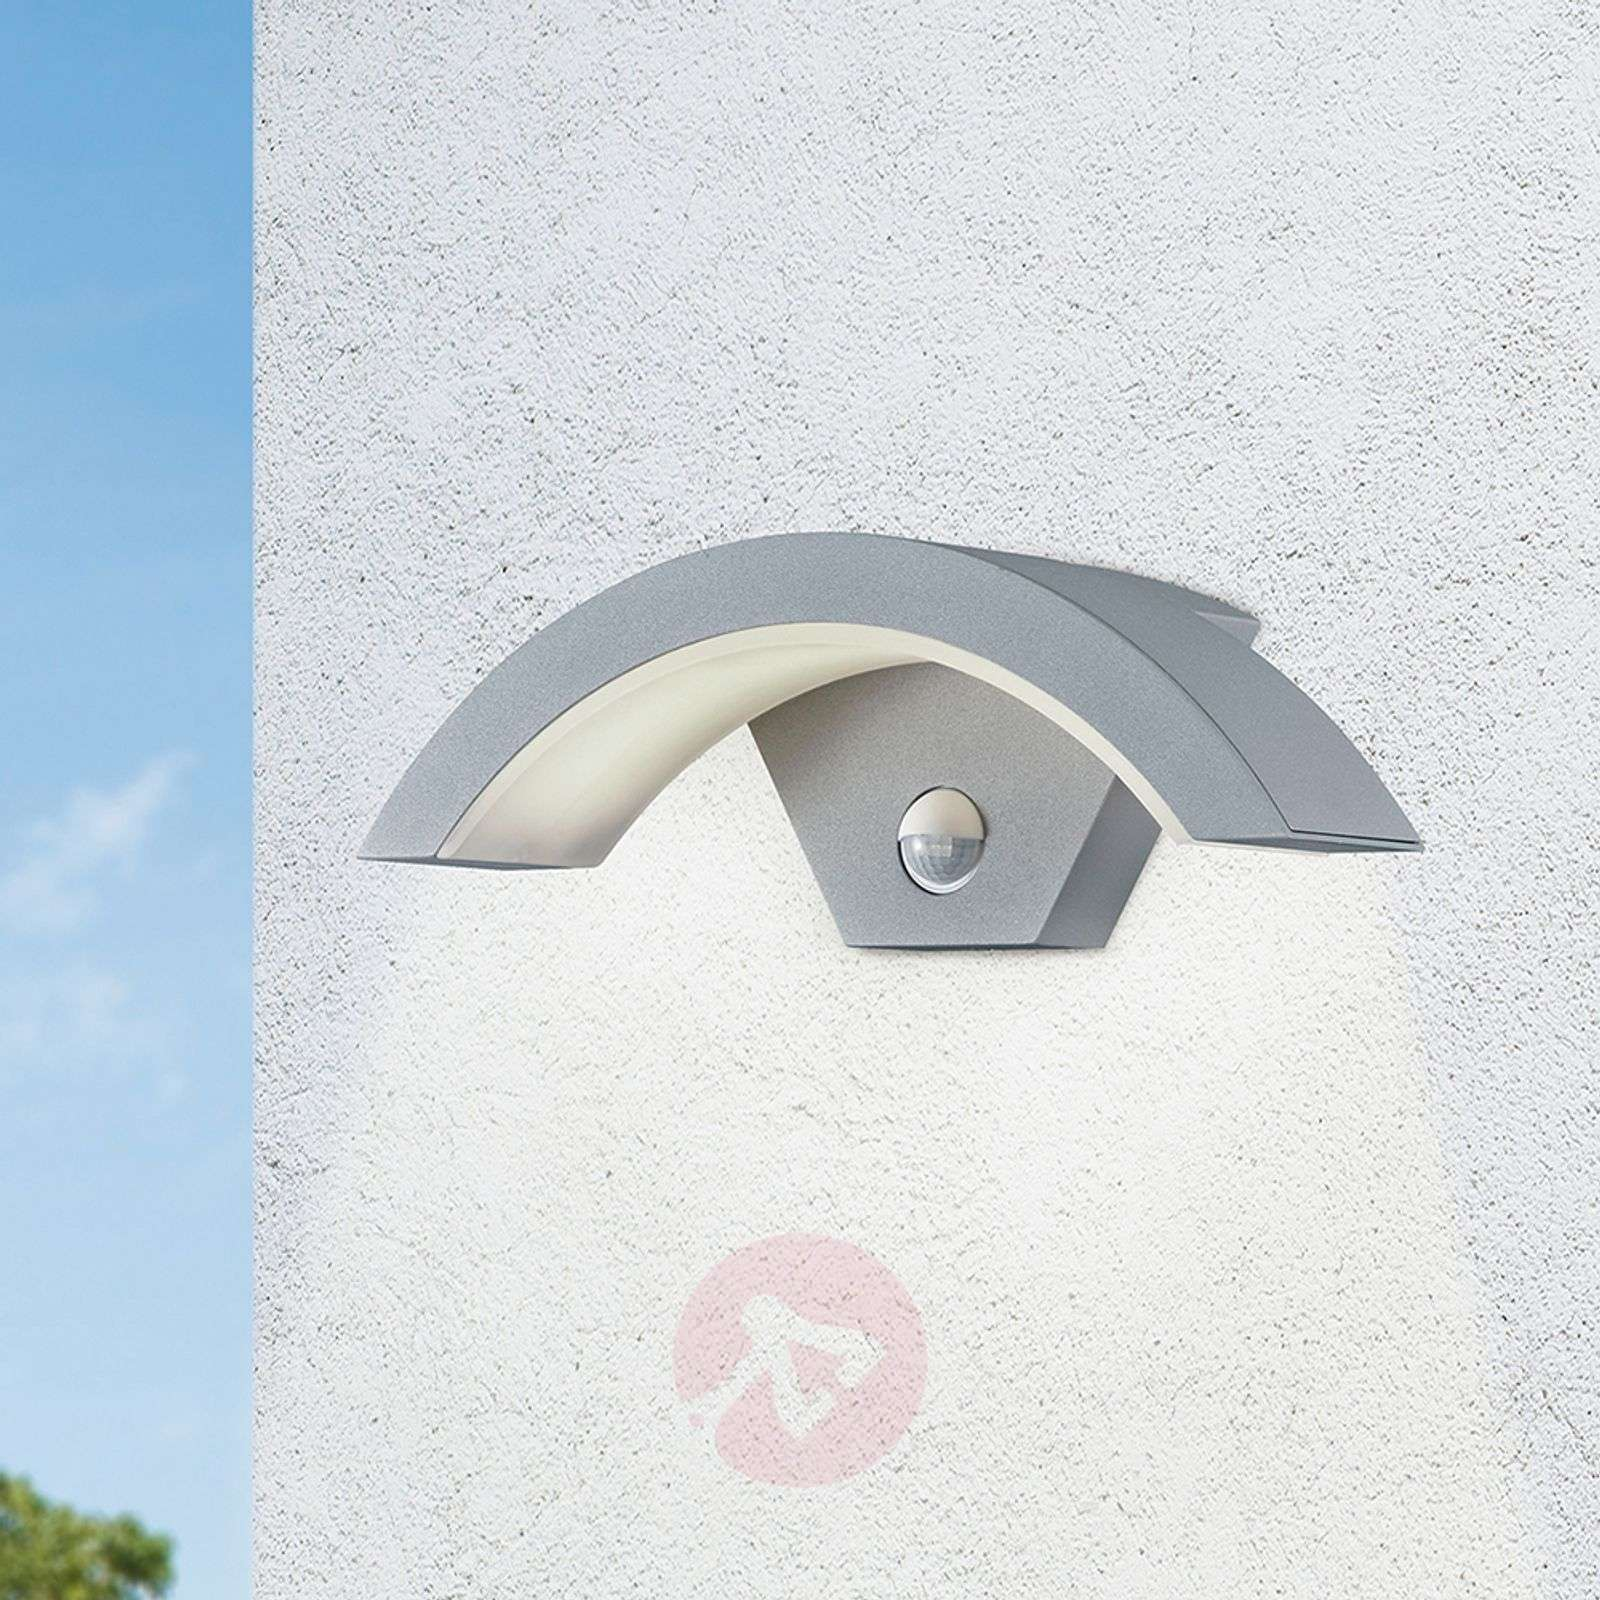 Ohio LED outdoor wall light, sensor, titanium col.-9004659-02